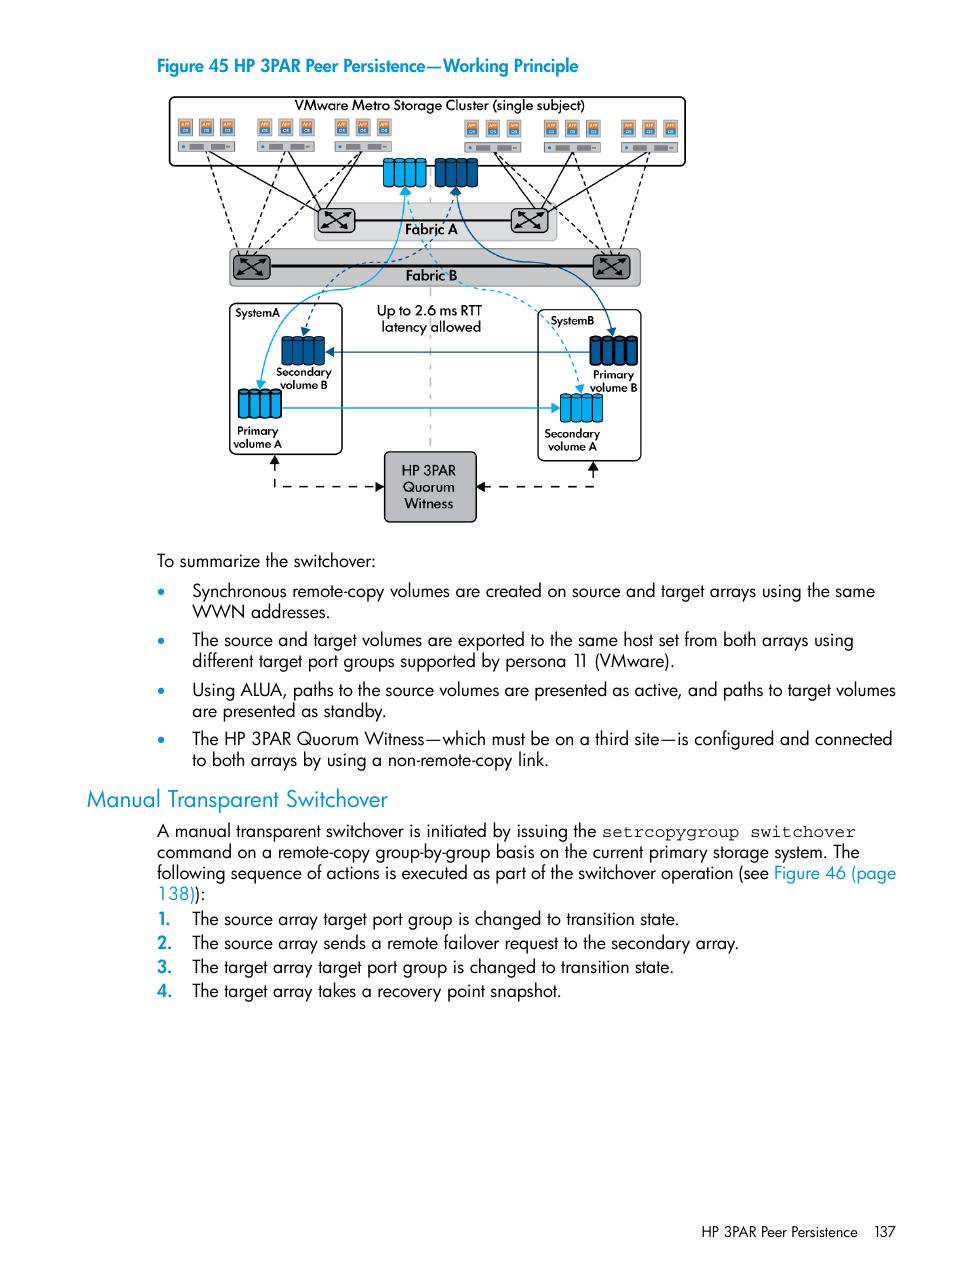 Manual transparent switchover, Hp 3par peer persistence